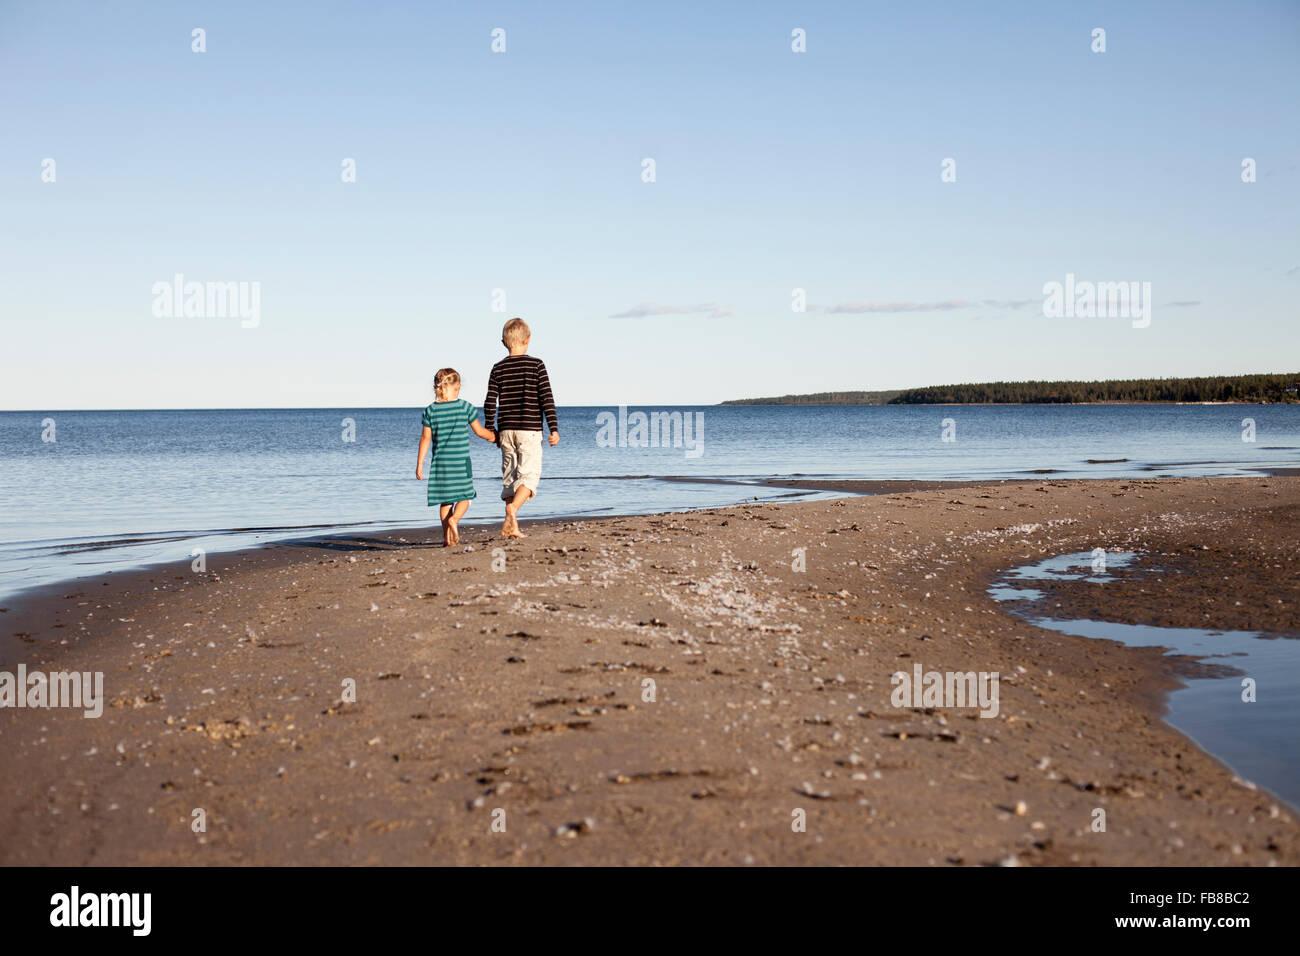 Sweden, Medelpad, Bergafjarden, Brother (10-11) with sister (6-7) walking along Baltic coast - Stock Image